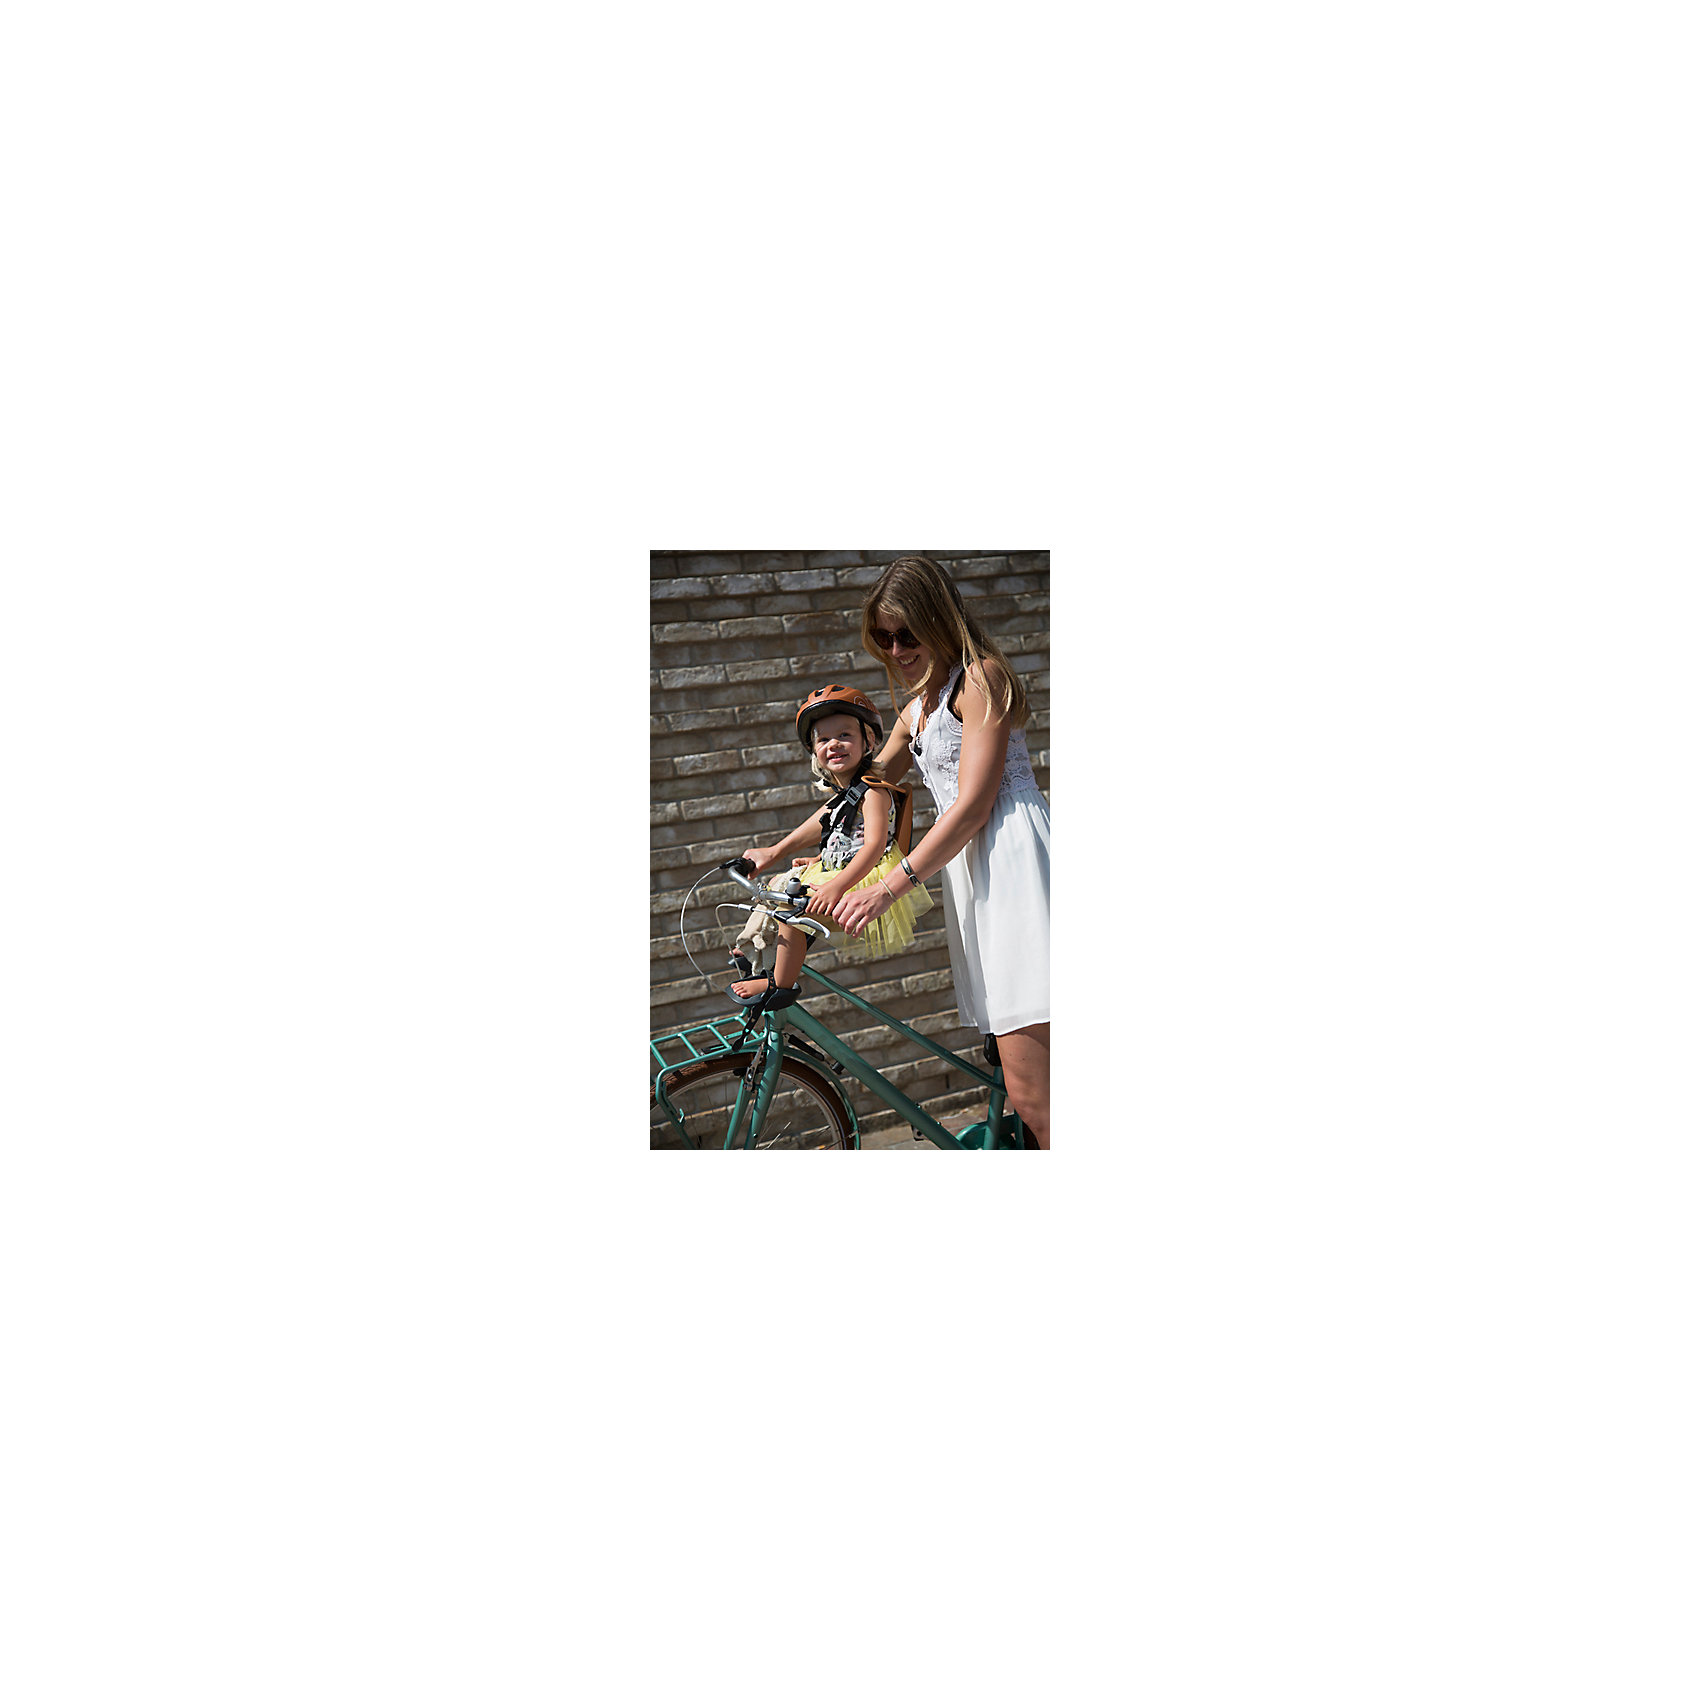 Neu bobike bobike bobike Fahrrad-Sicherheitssitz Mini ONE, front, Sky Blau 5140303 8e0a37